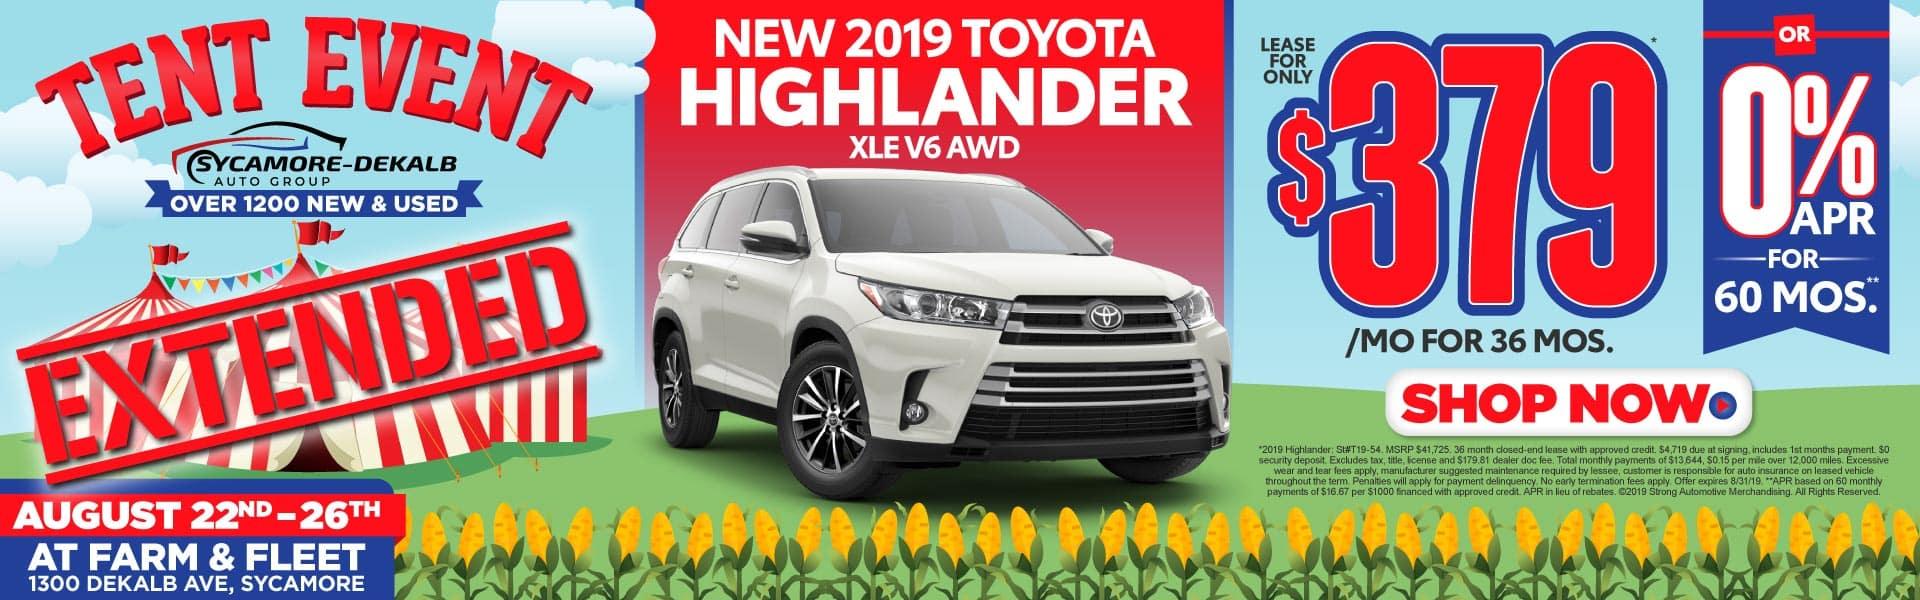 Toyota Of Dekalb New Toyota Used Car Dealership In Dekalb Il